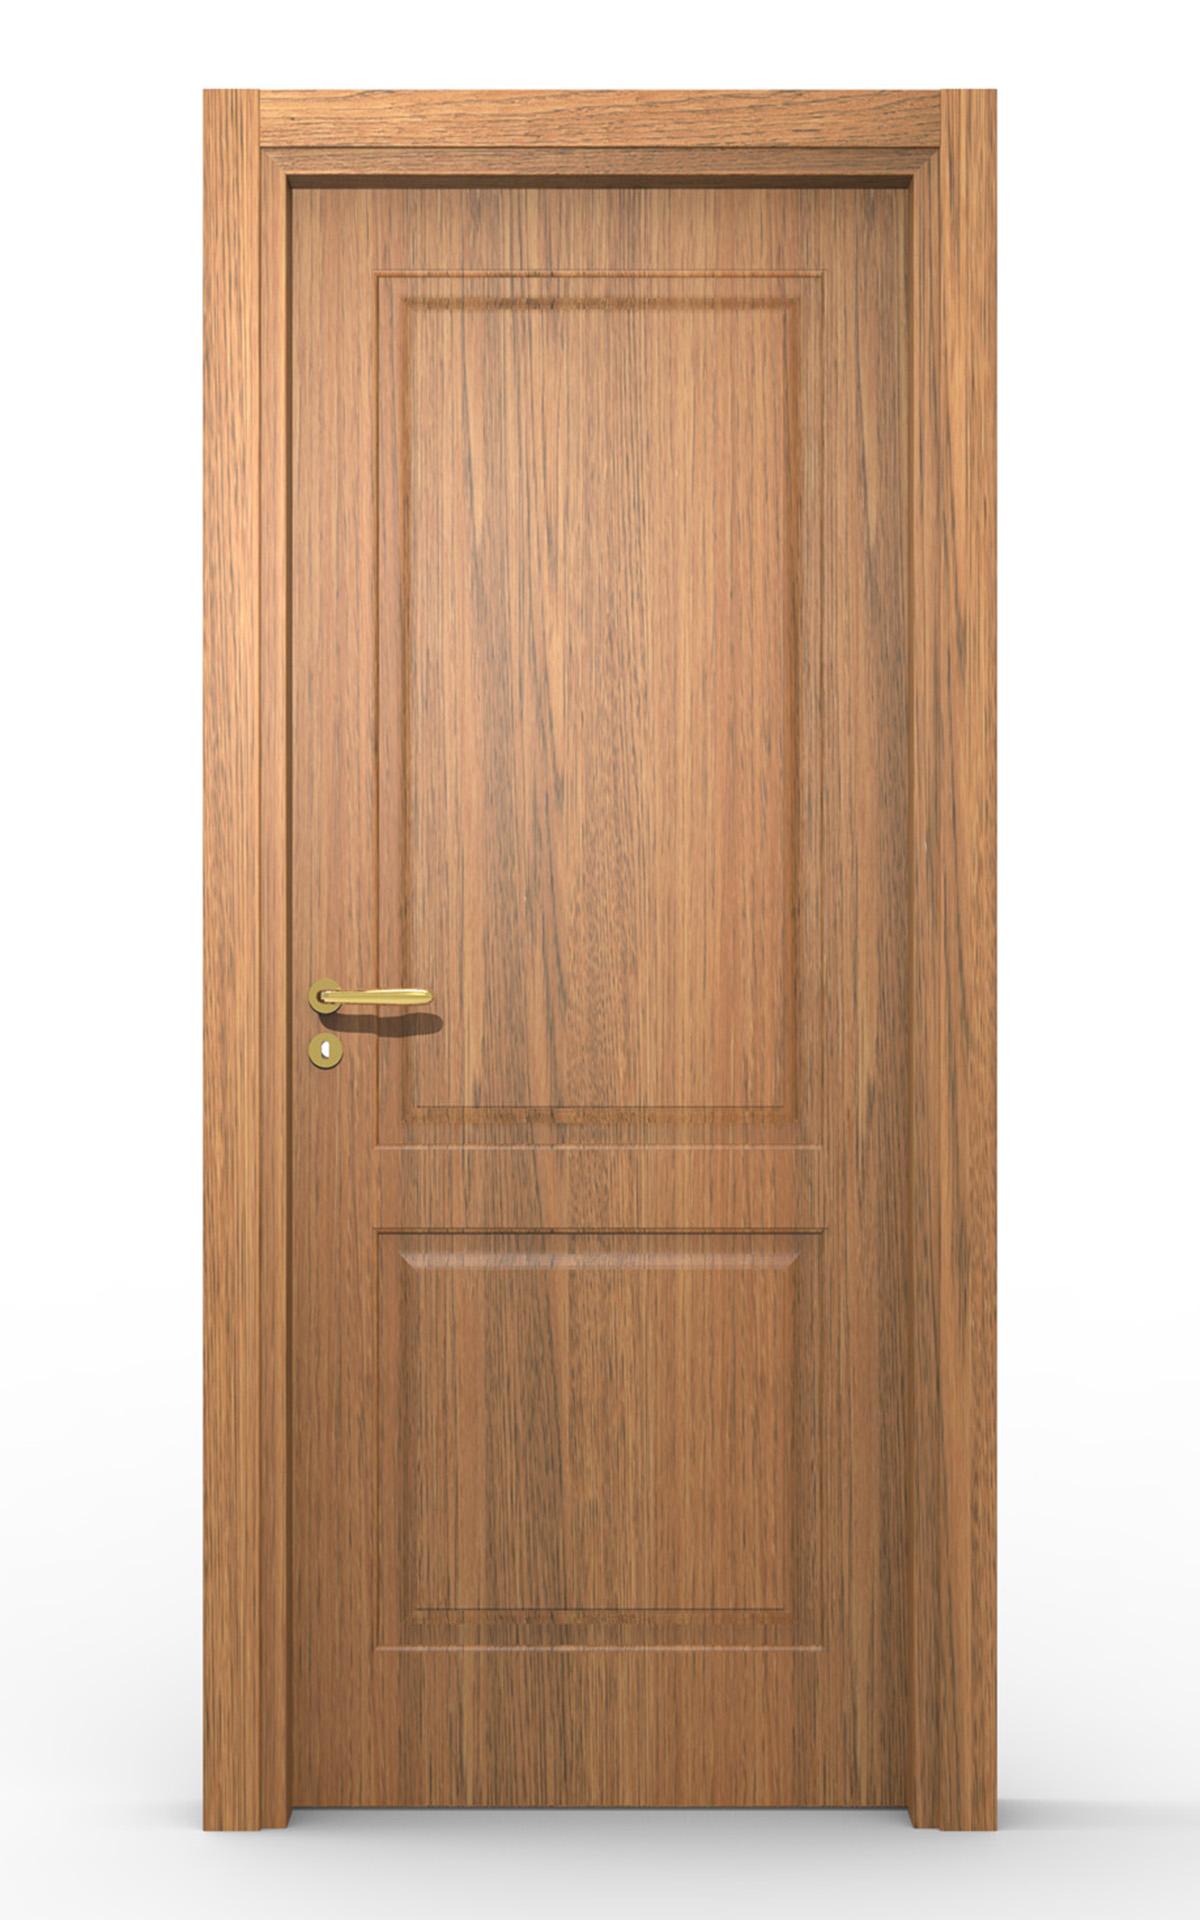 Porte legno pantografate garone habitat for Garone habitat